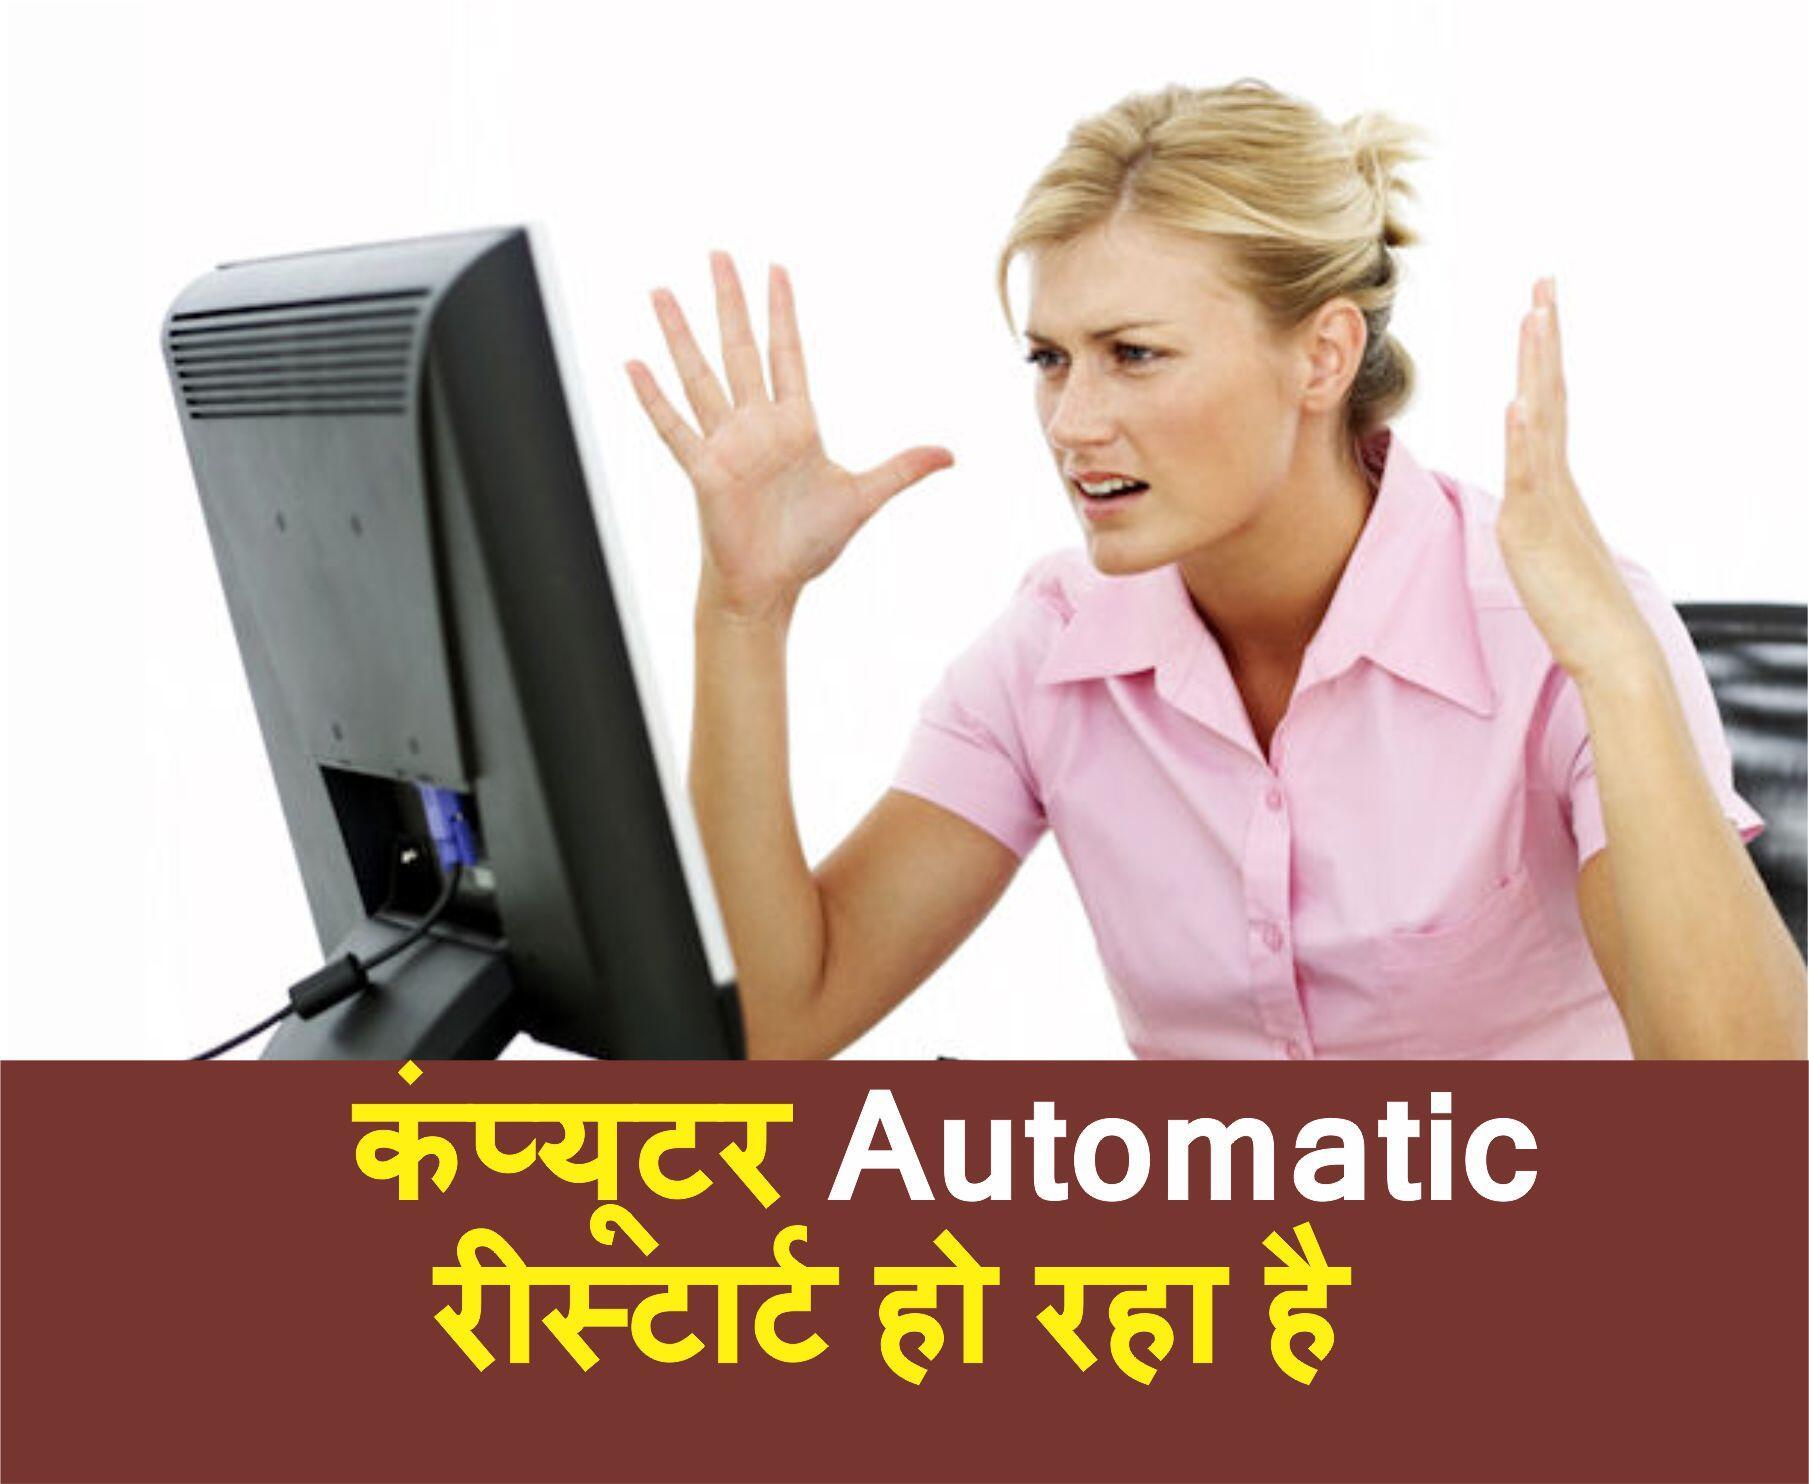 Computer Aapne aap restart ho raha hai